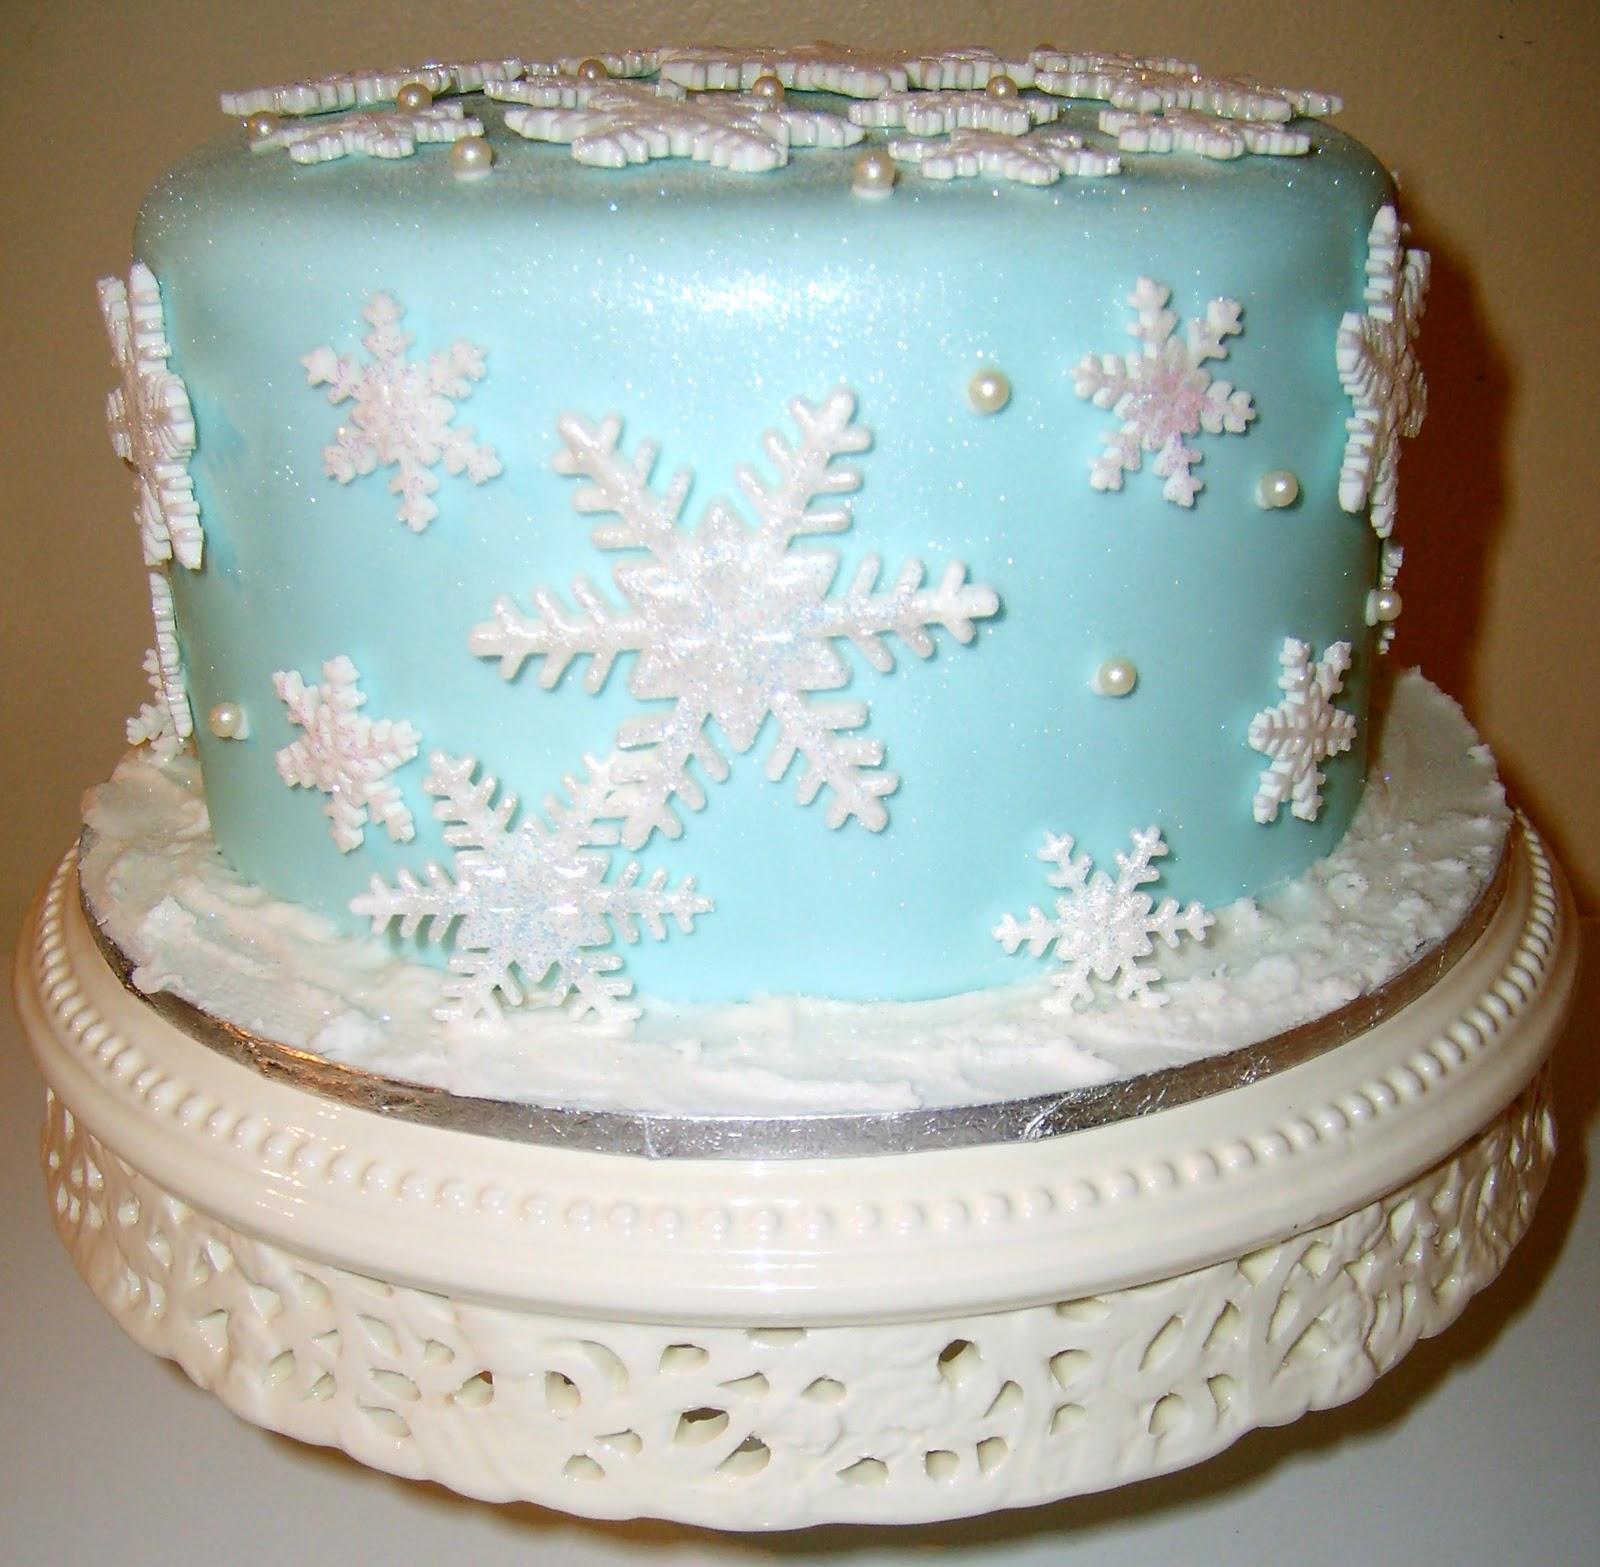 Magnificent 8 Snowflake Birthday Cakes Buttercream Photo Birthday Cake Funny Birthday Cards Online Fluifree Goldxyz